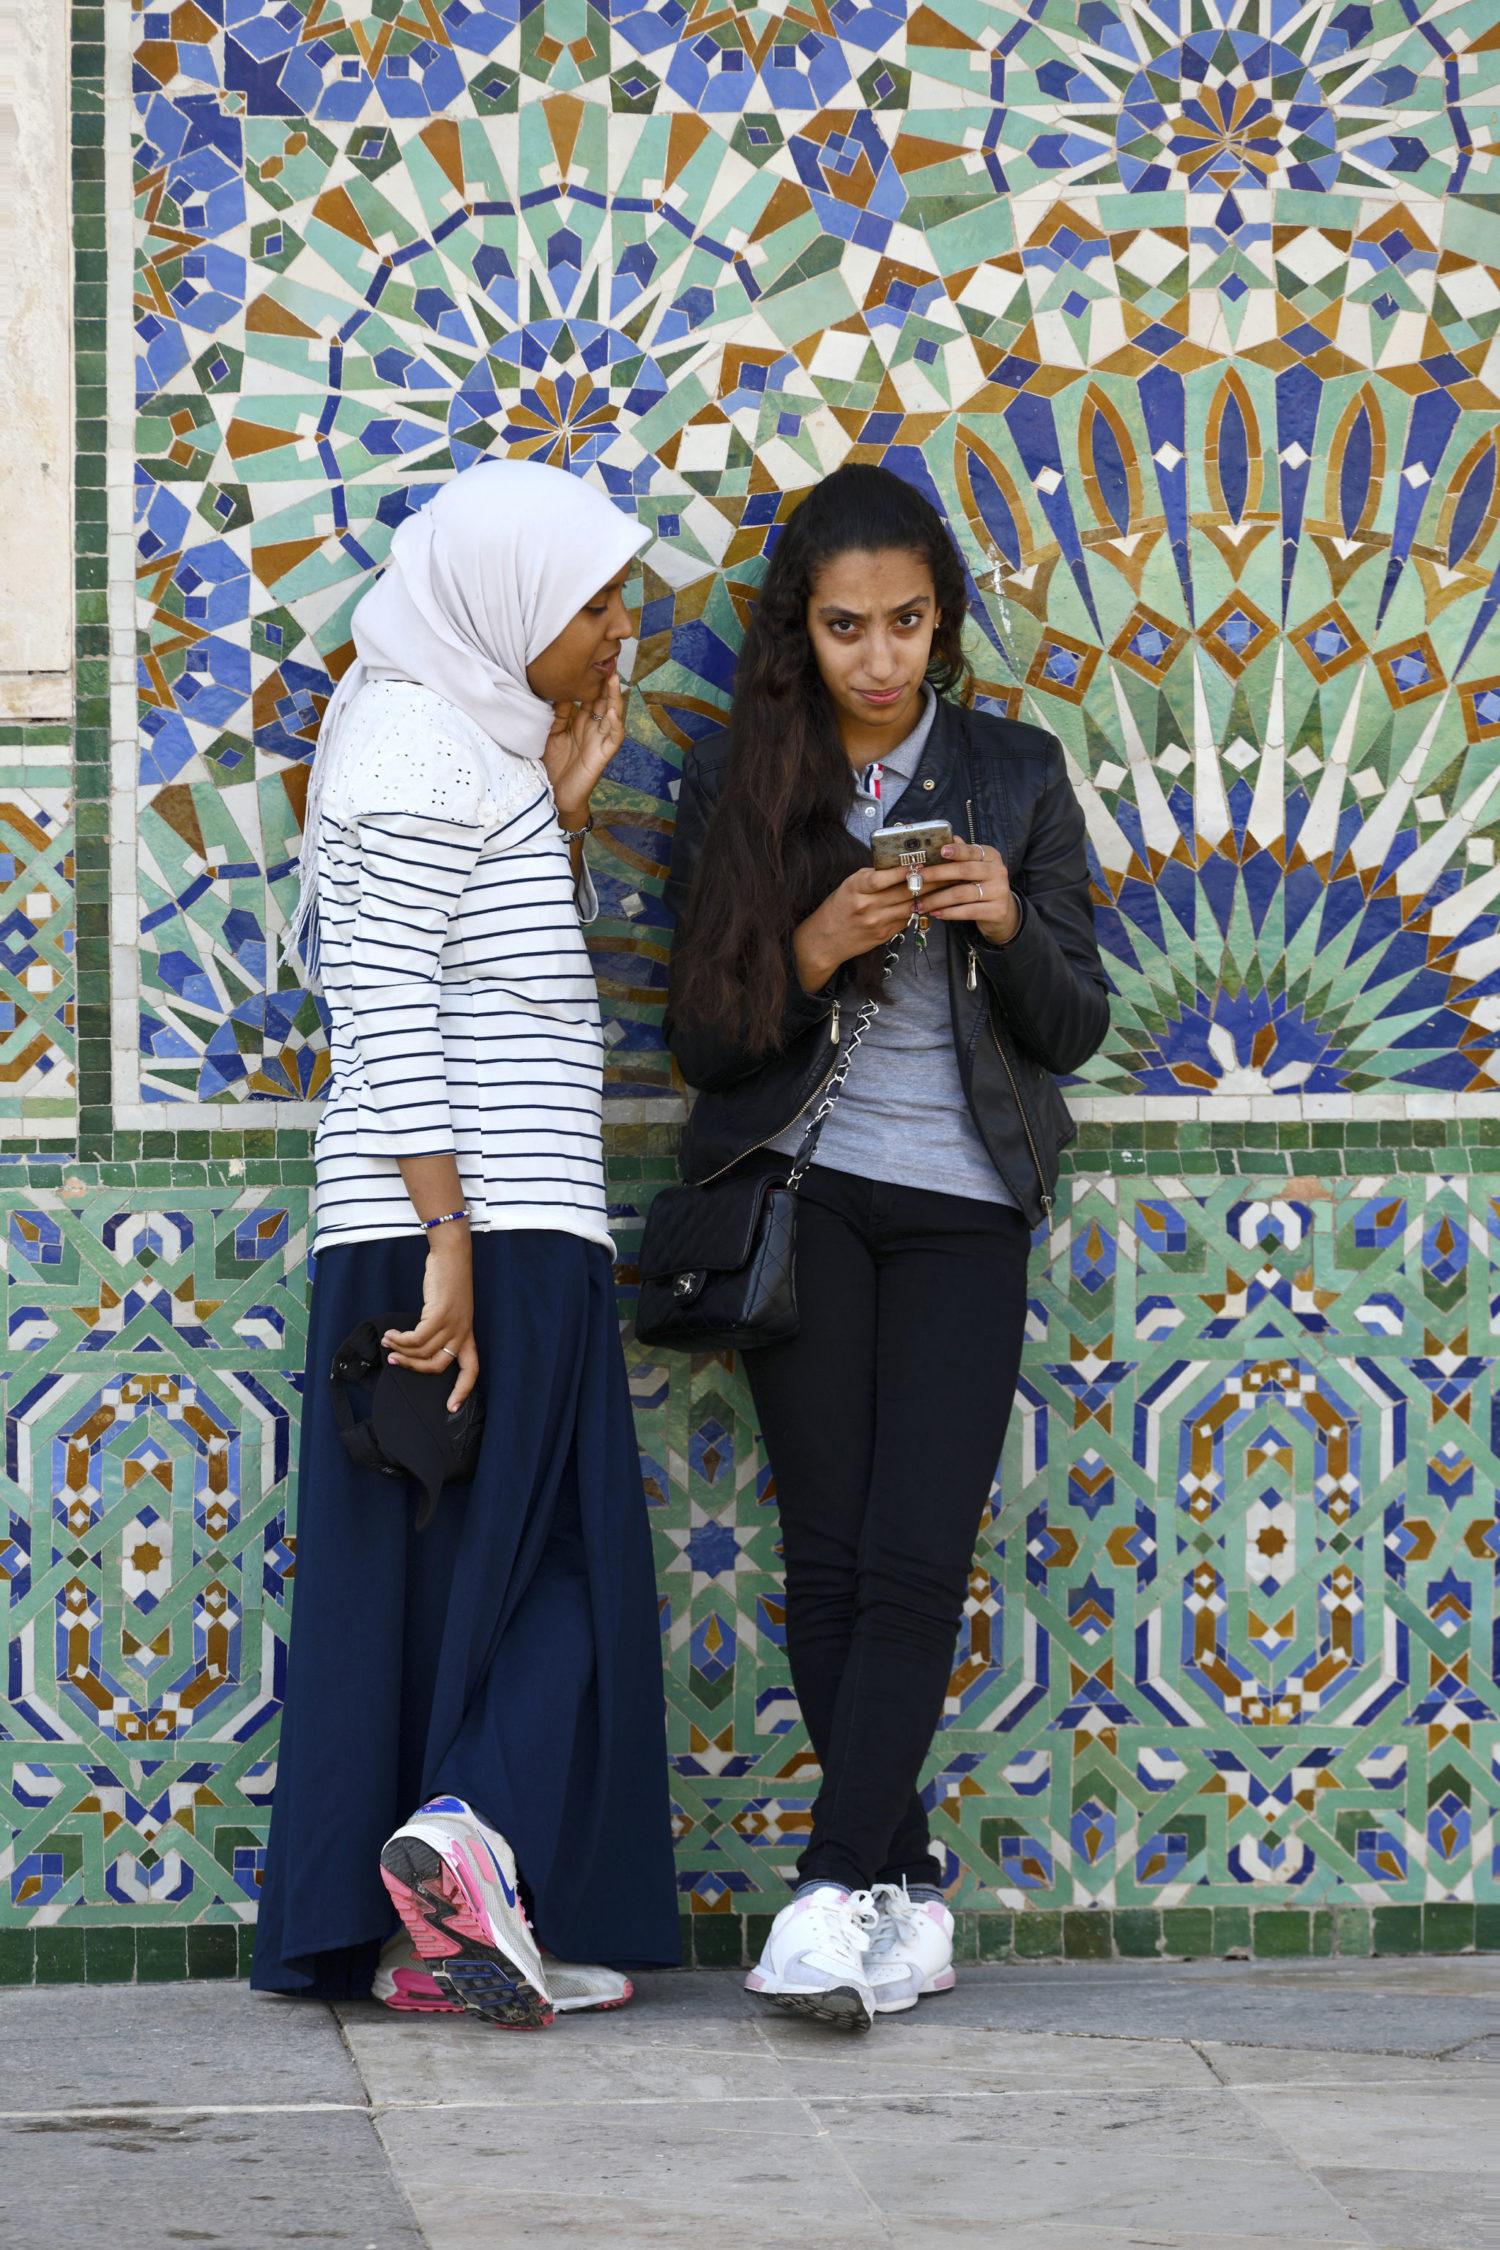 interraciale dating in Amerika deel 2